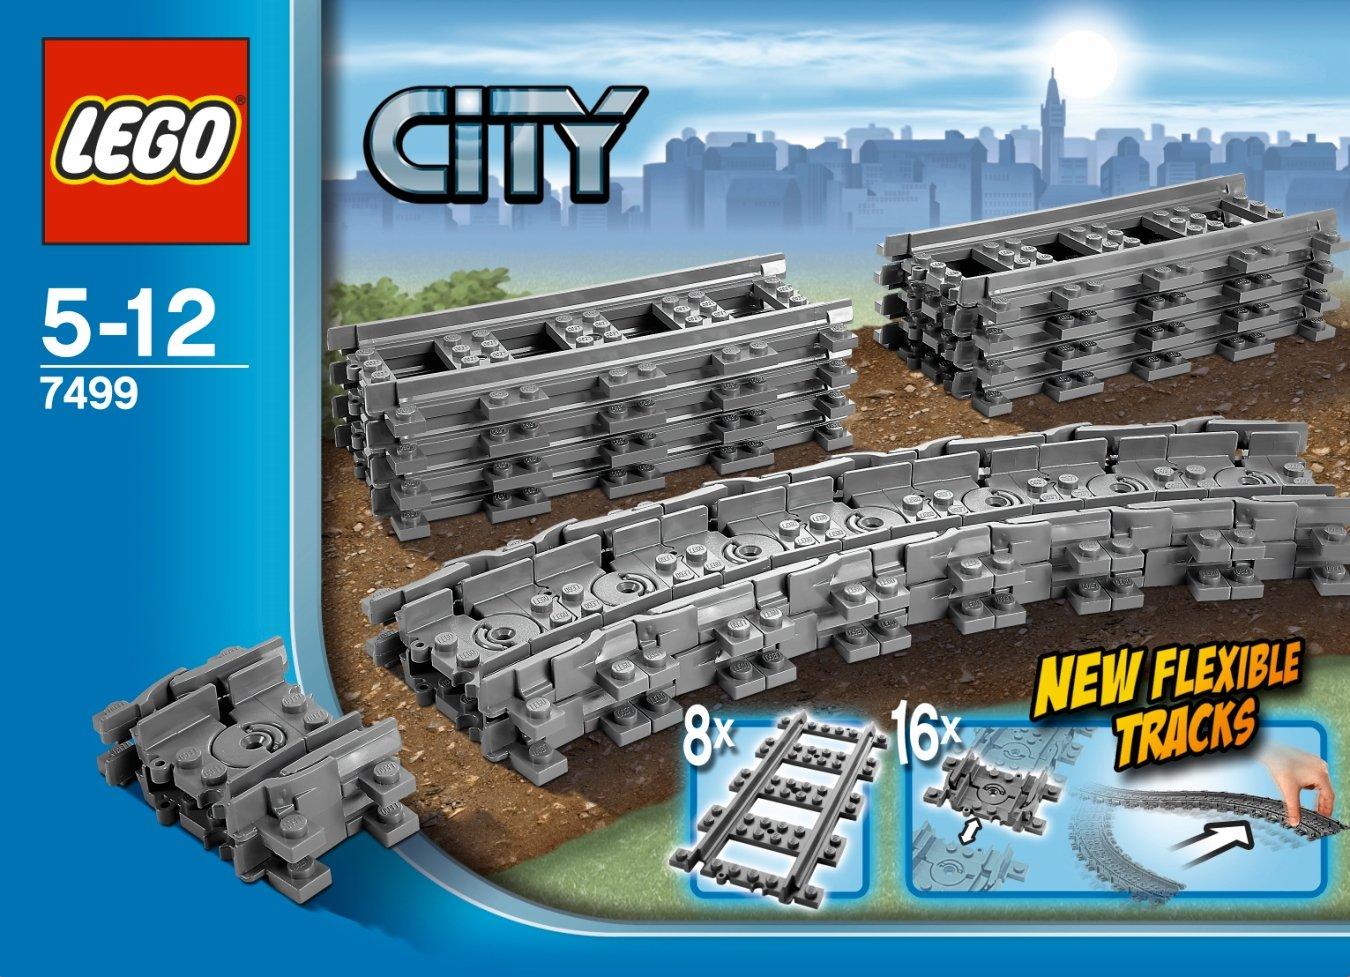 LEGO City Flexible Tracks 7499 Train Toy Accessory 4609430